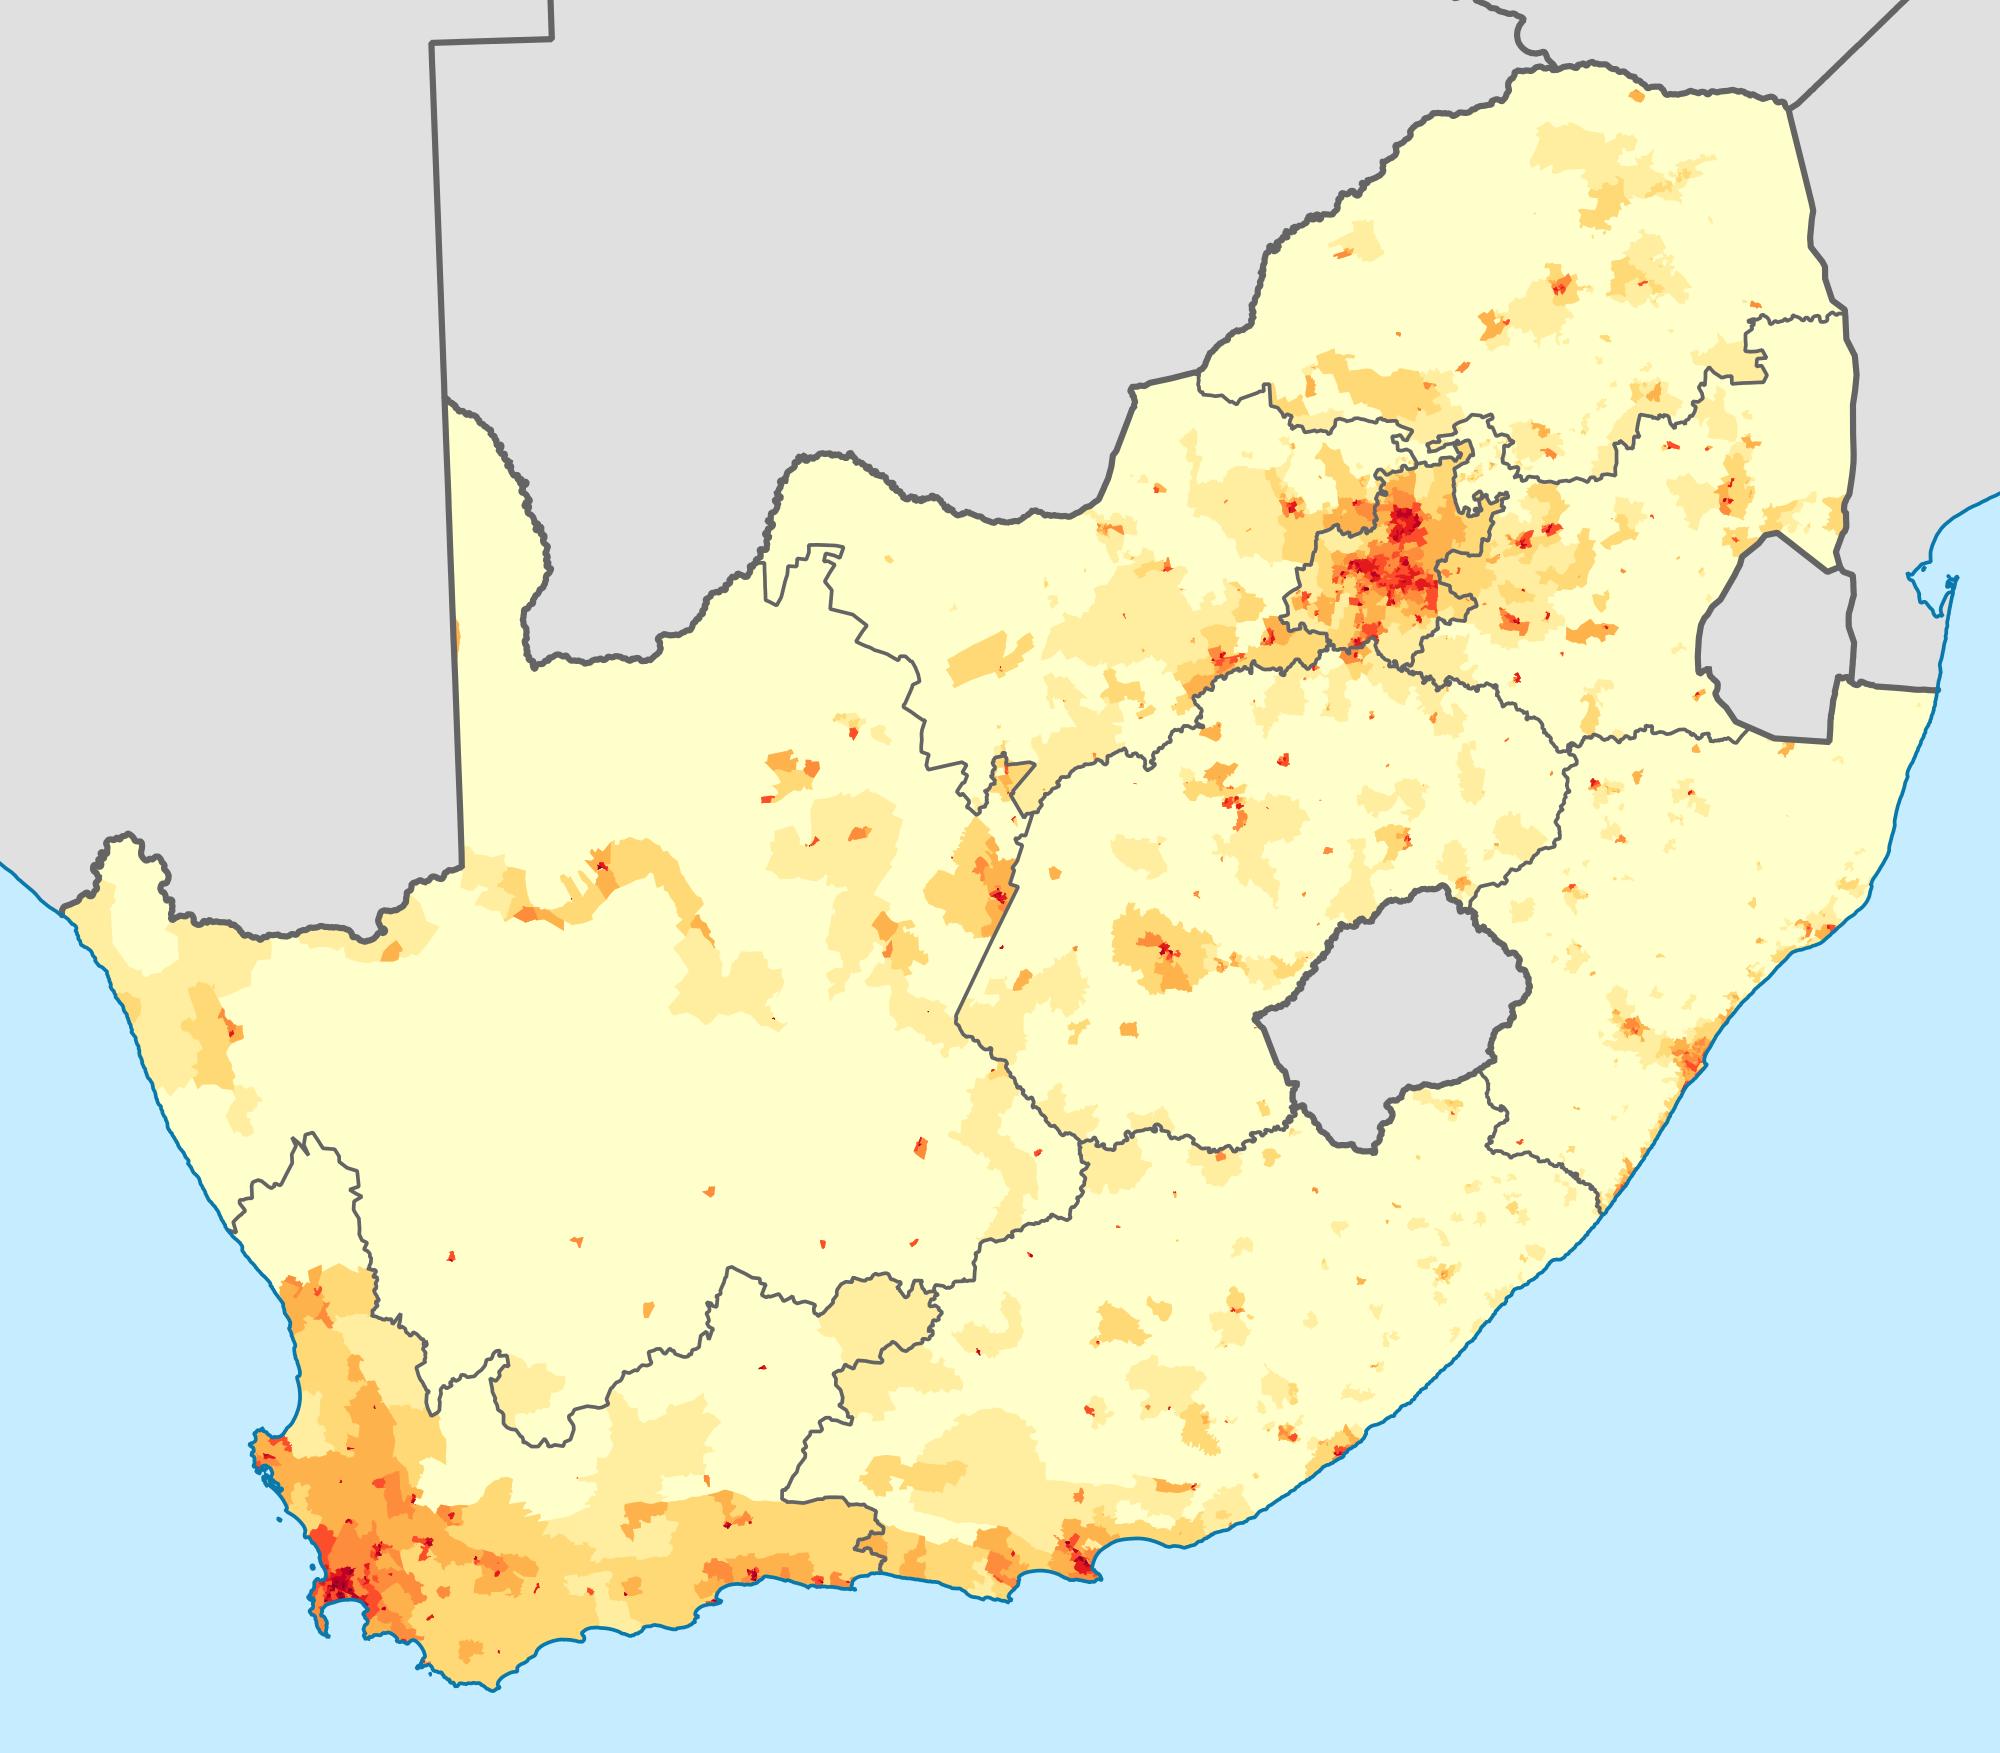 beginning of Afrikaans